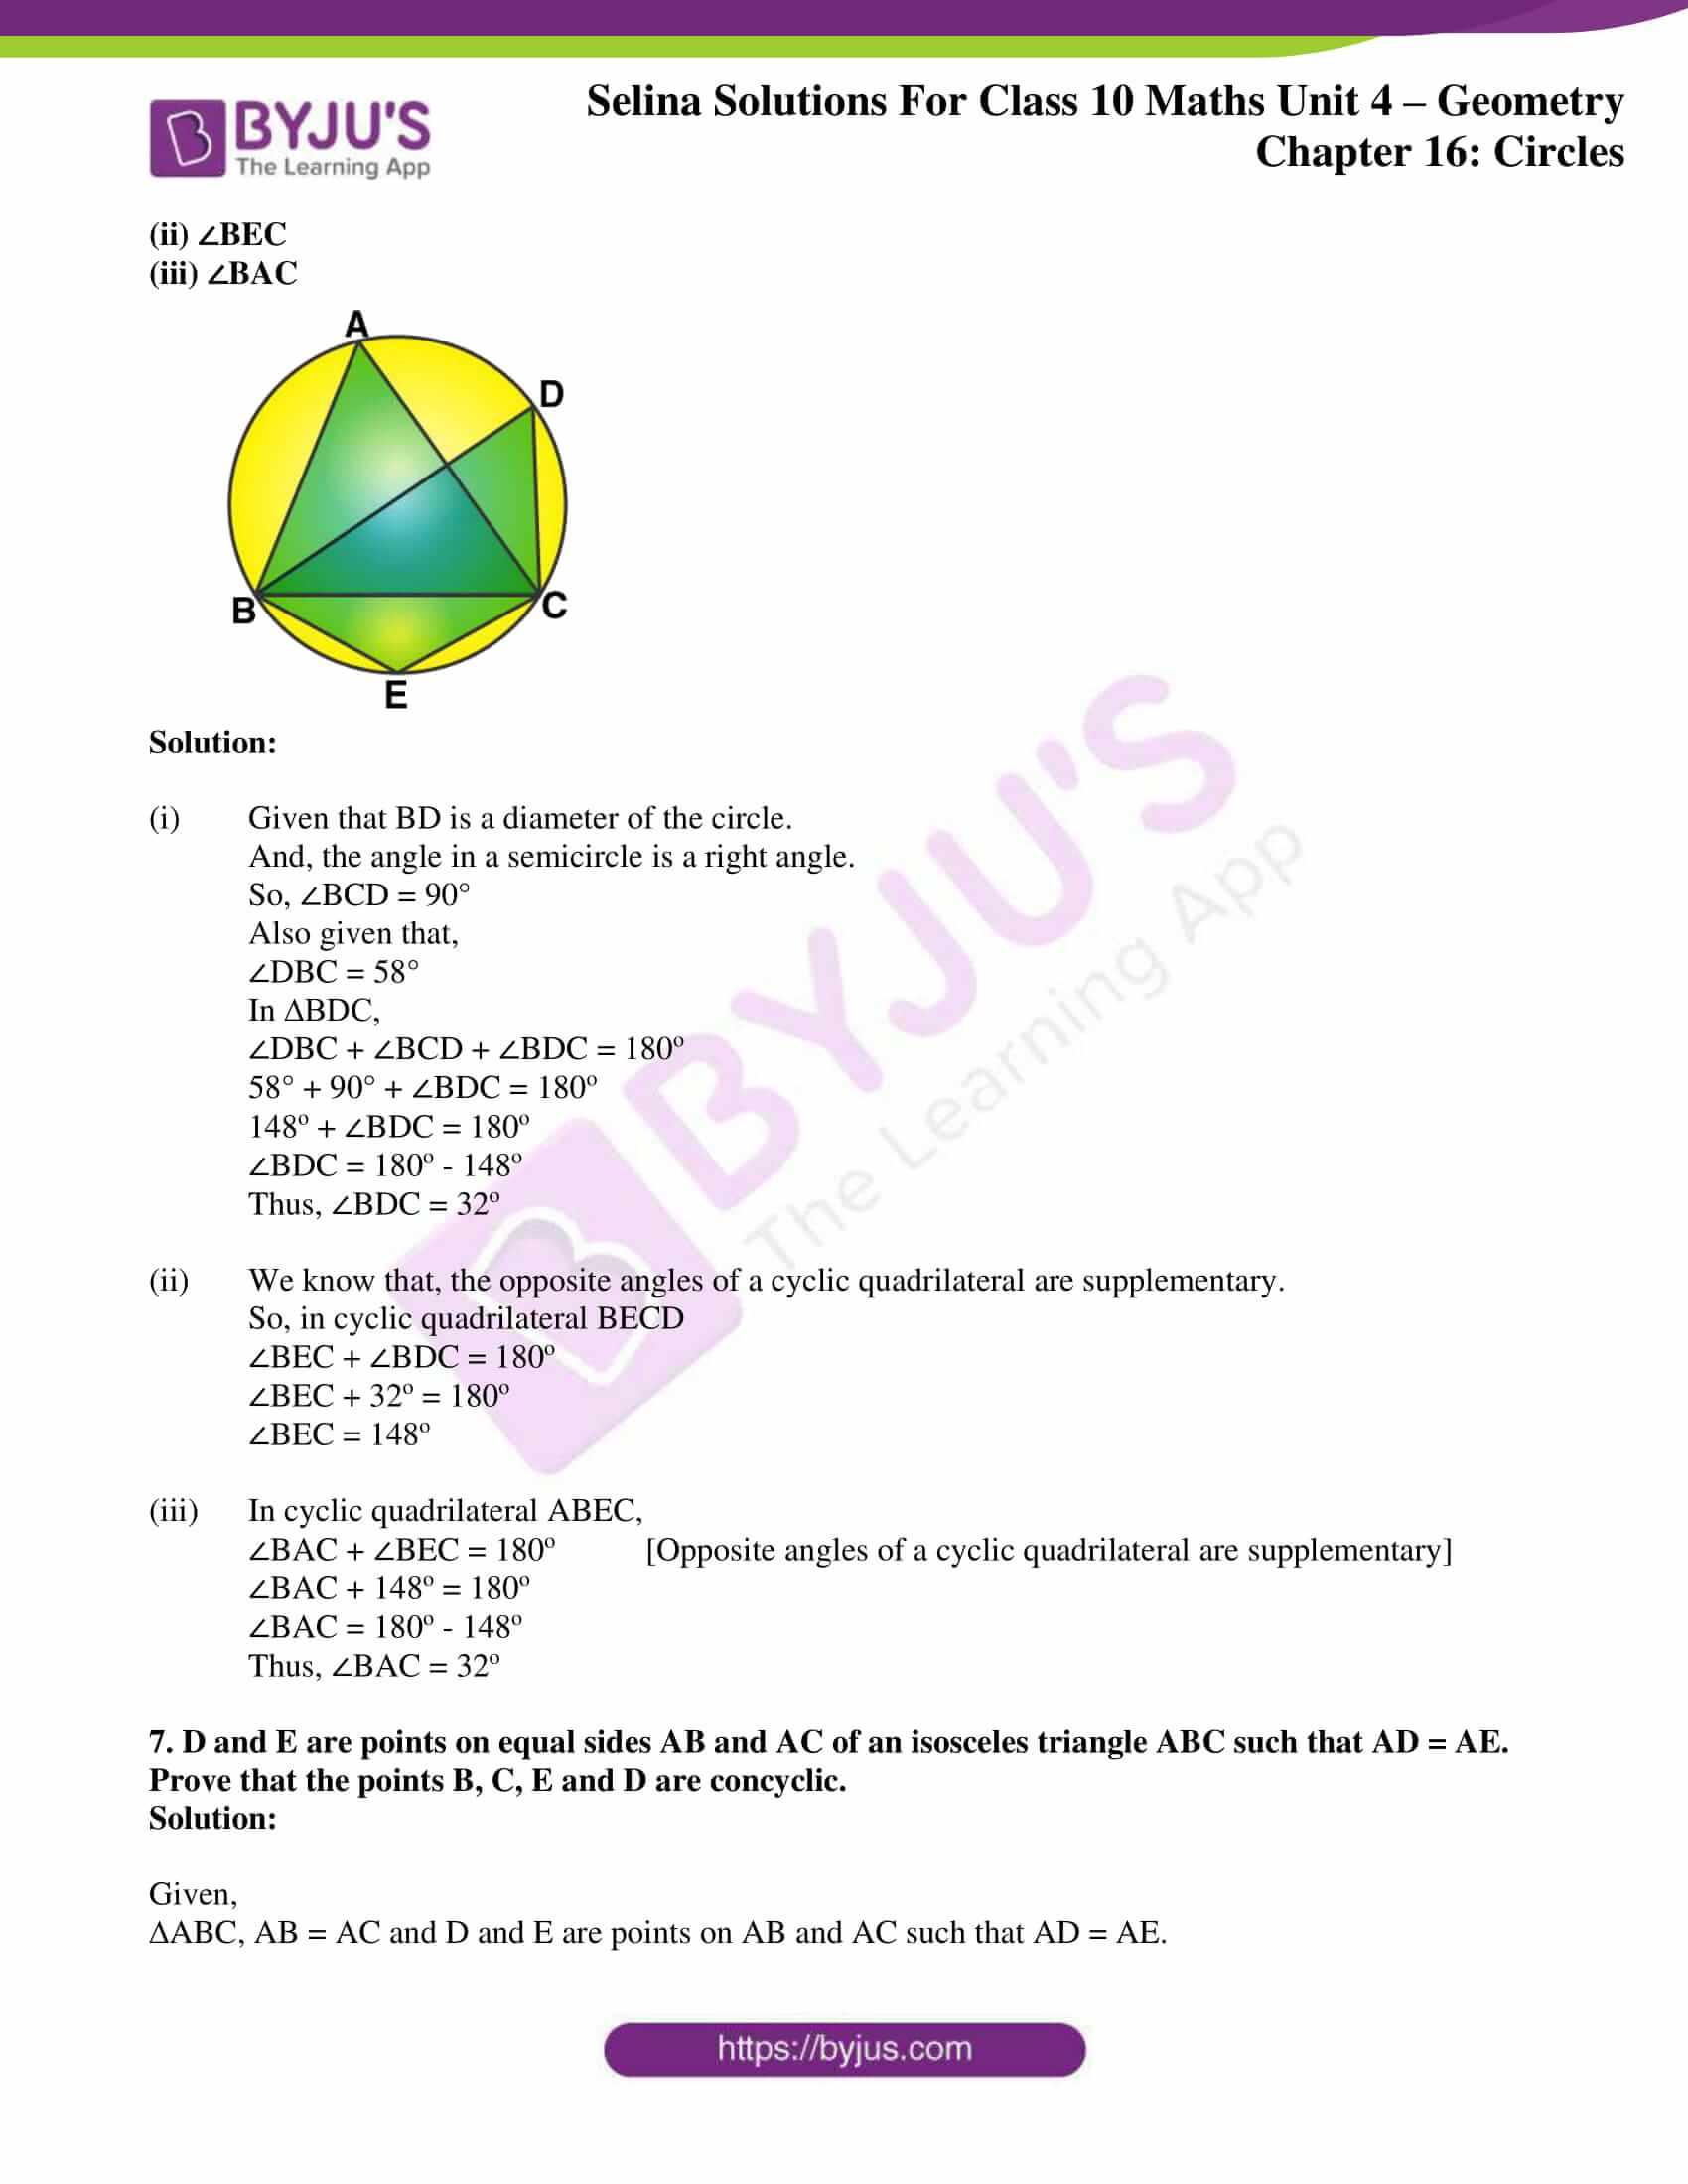 selina-sol-maths-class-10-ch-17-ex-c-4